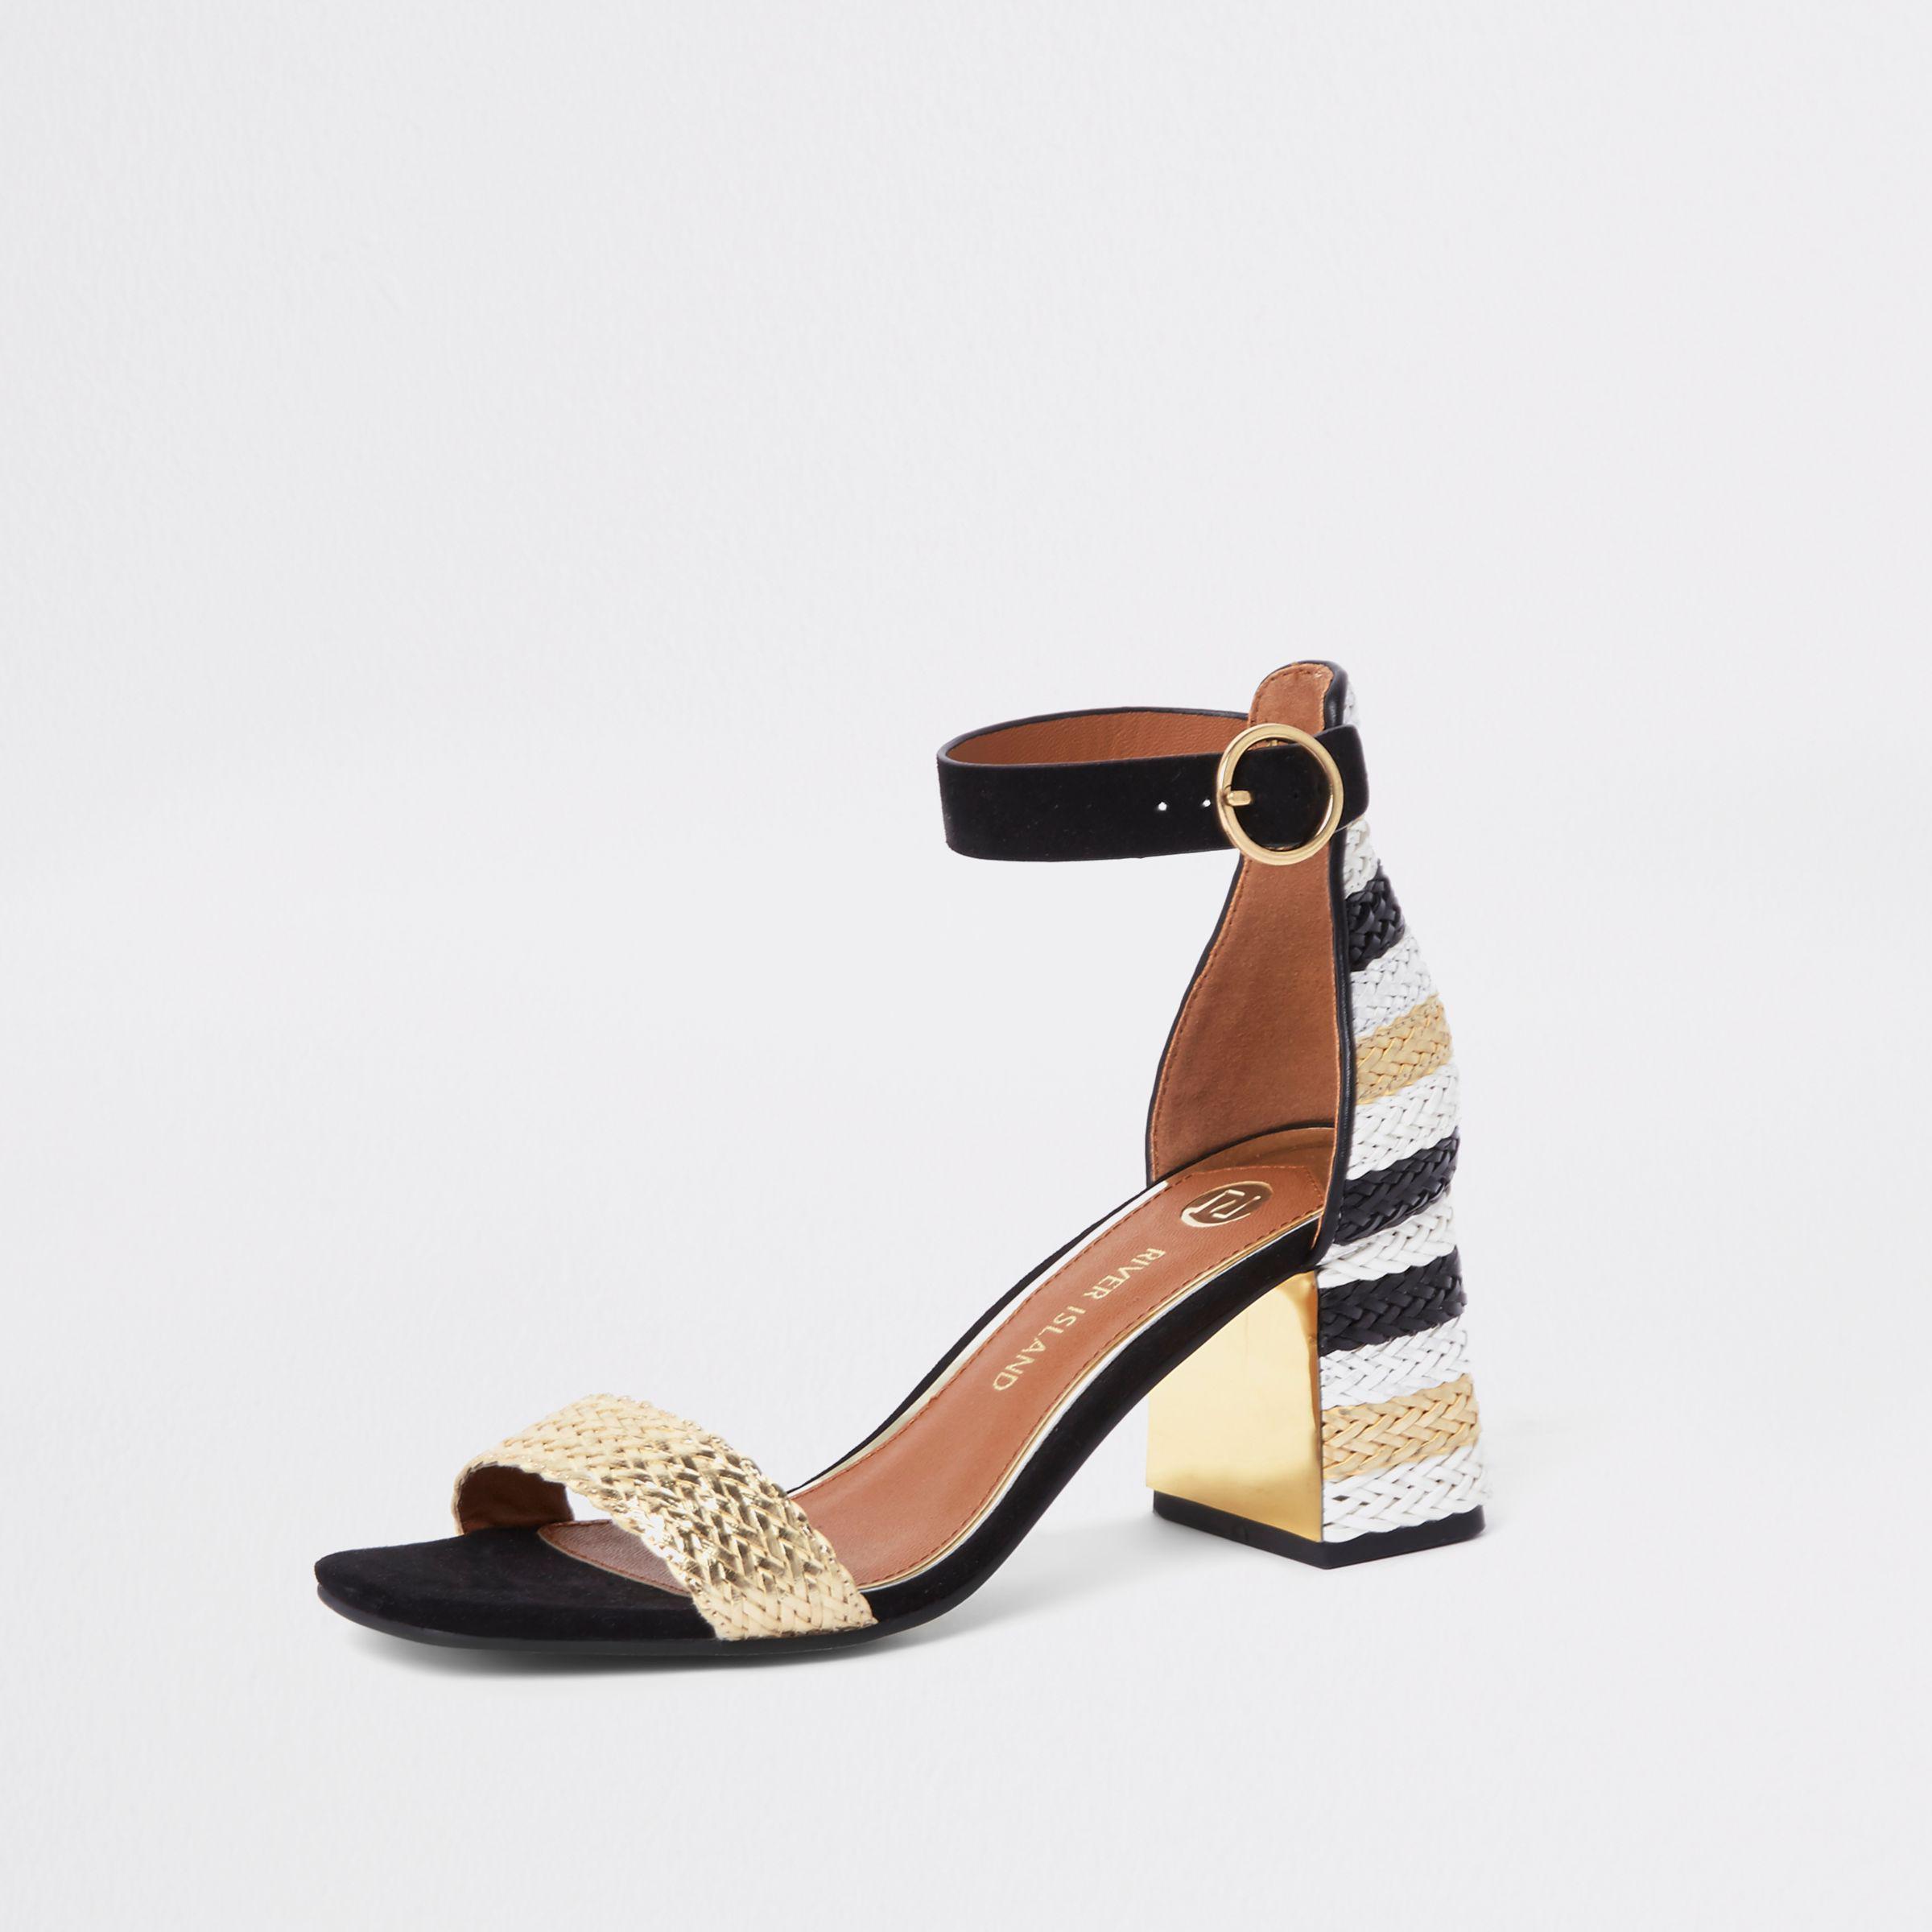 f534d302ce4f Lyst - River Island Black Woven Metallic Block Heel Sandals in Black